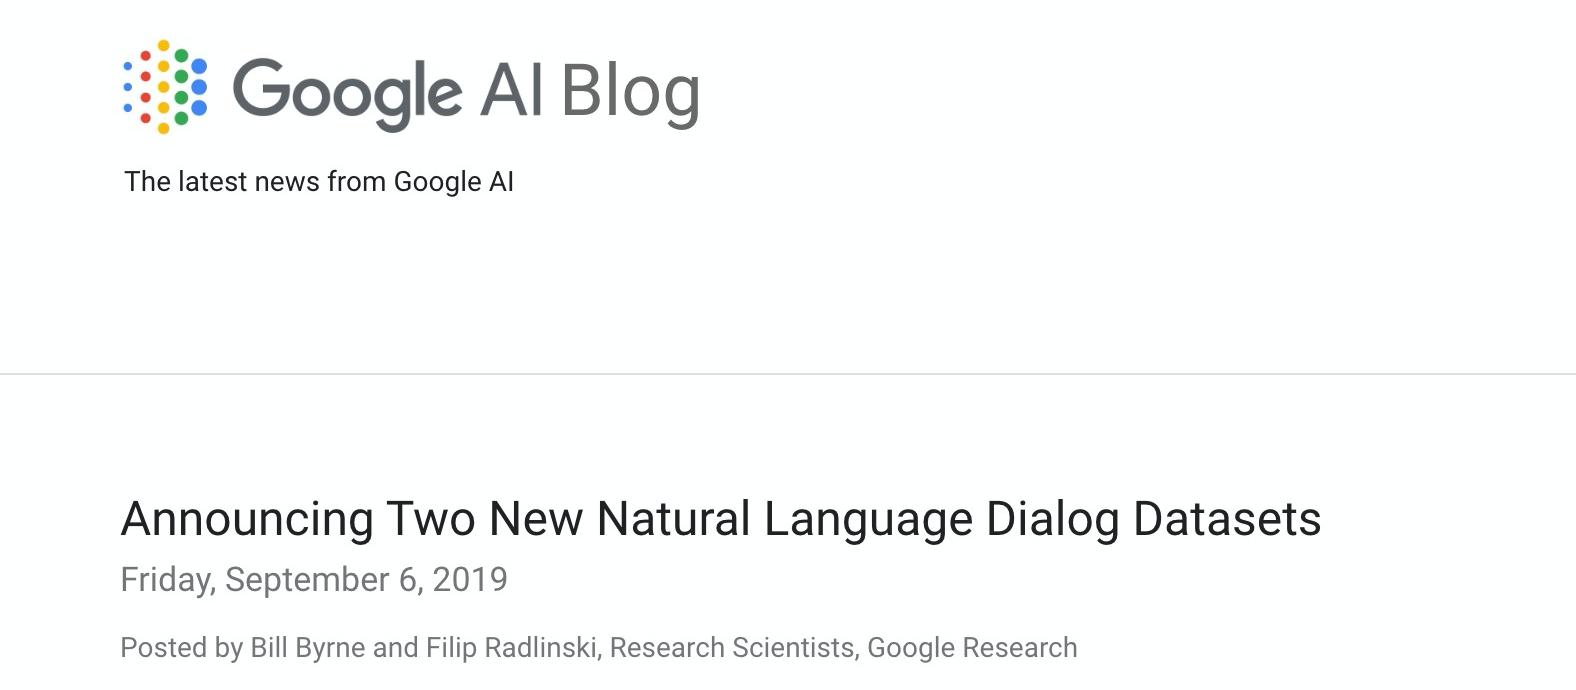 Google釋出兩神經語言對話資料集| iThome